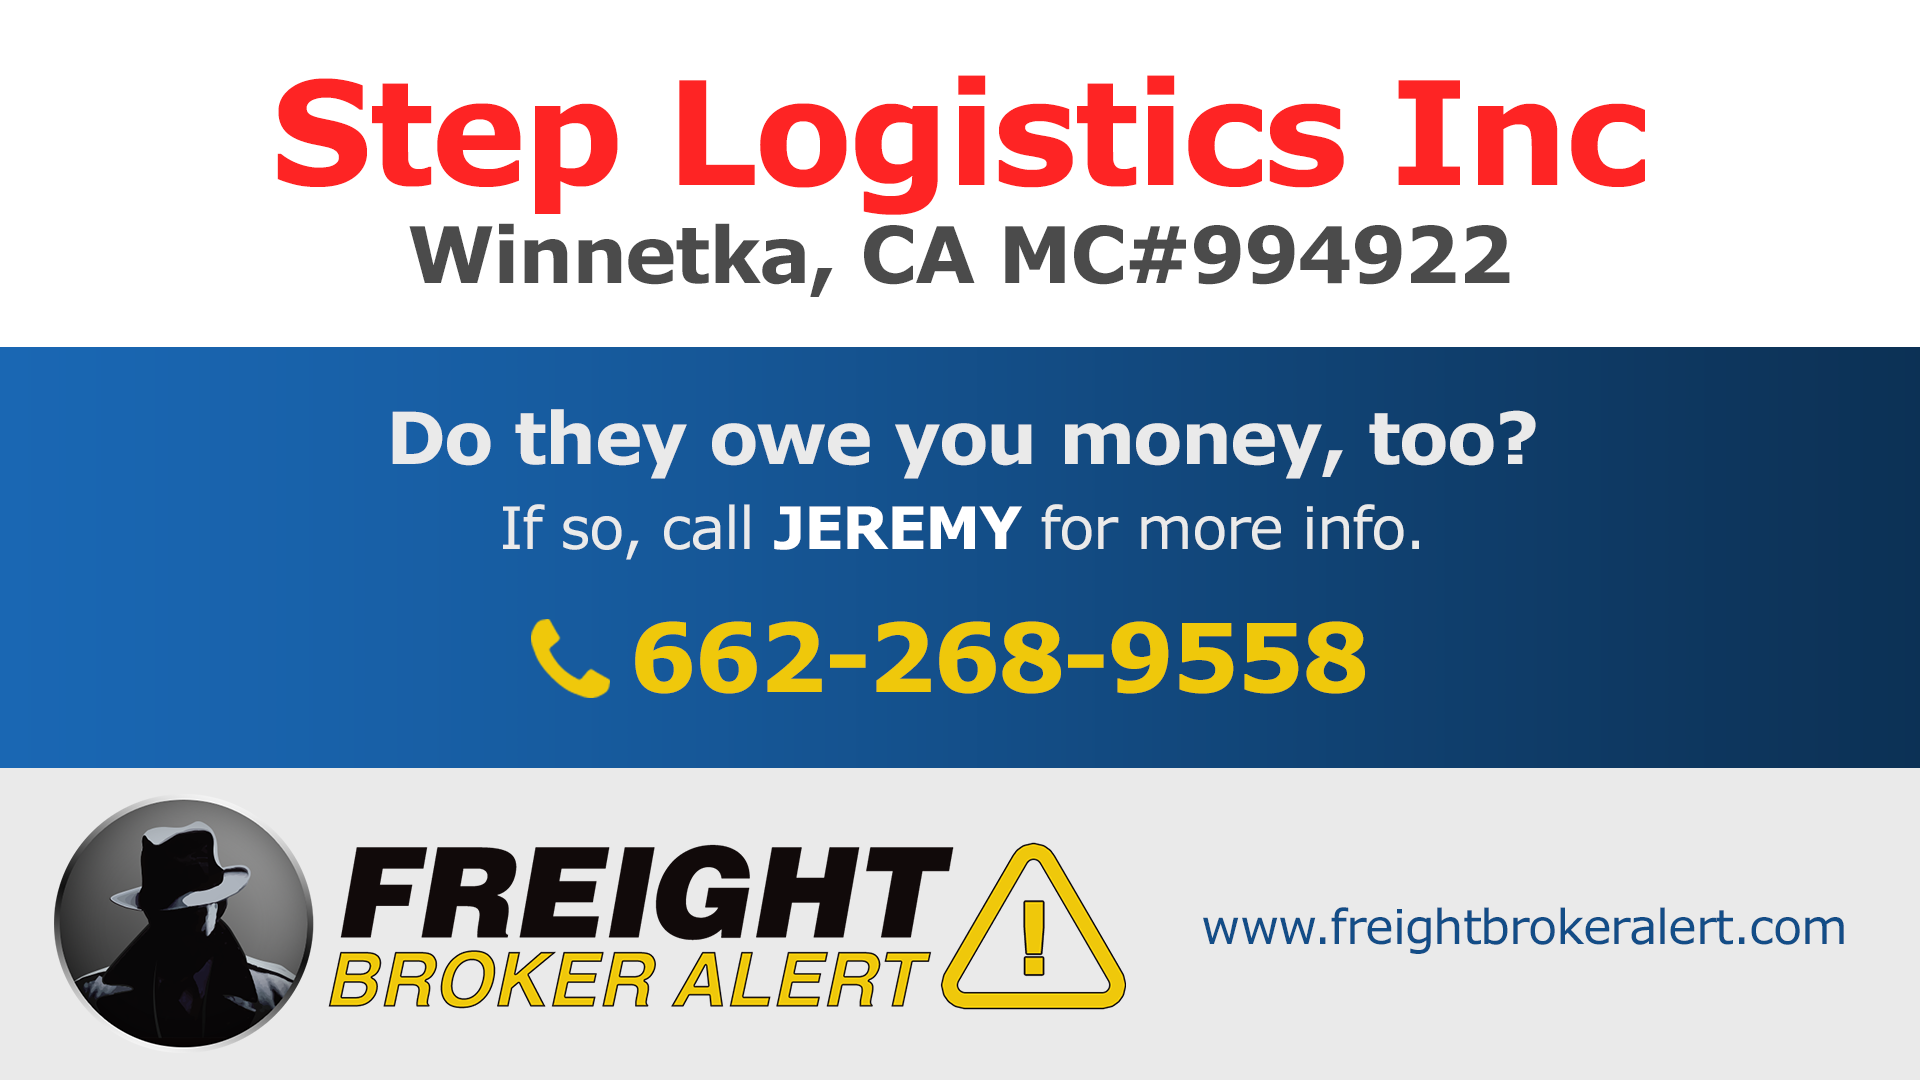 Step Logistics Inc California